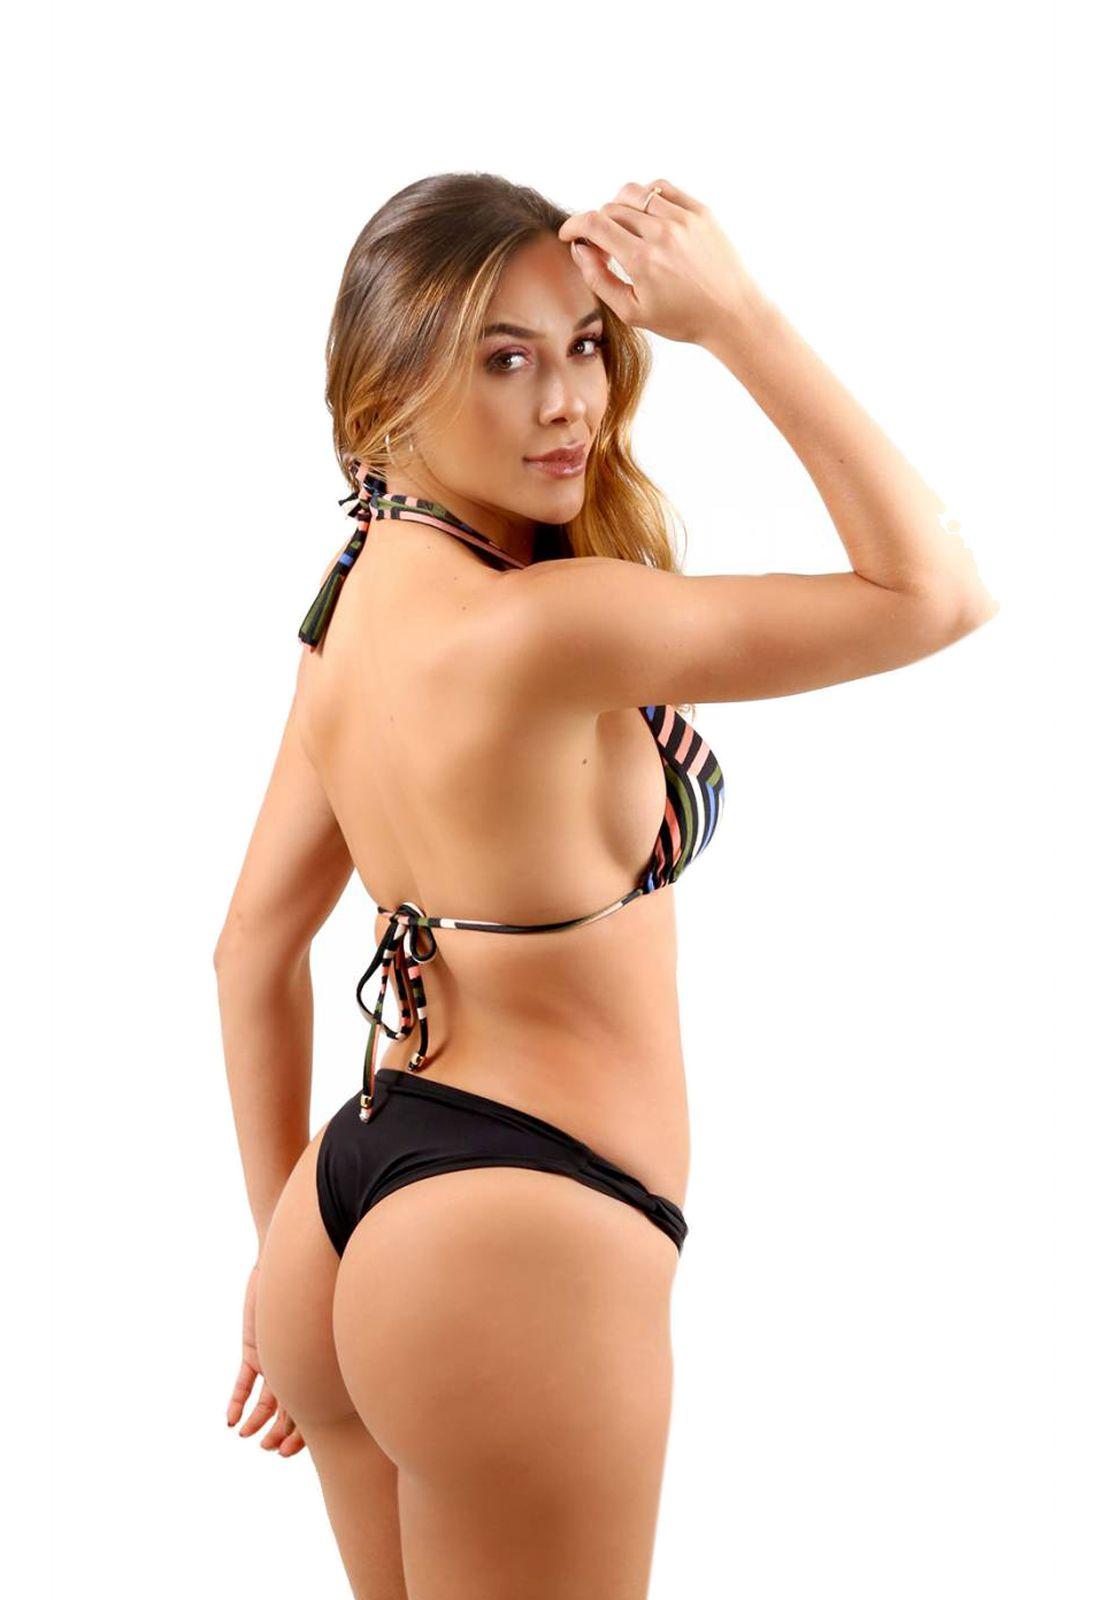 Biquíni Cortininha Flavia Donadio Beachwear Ravello com tanga preta